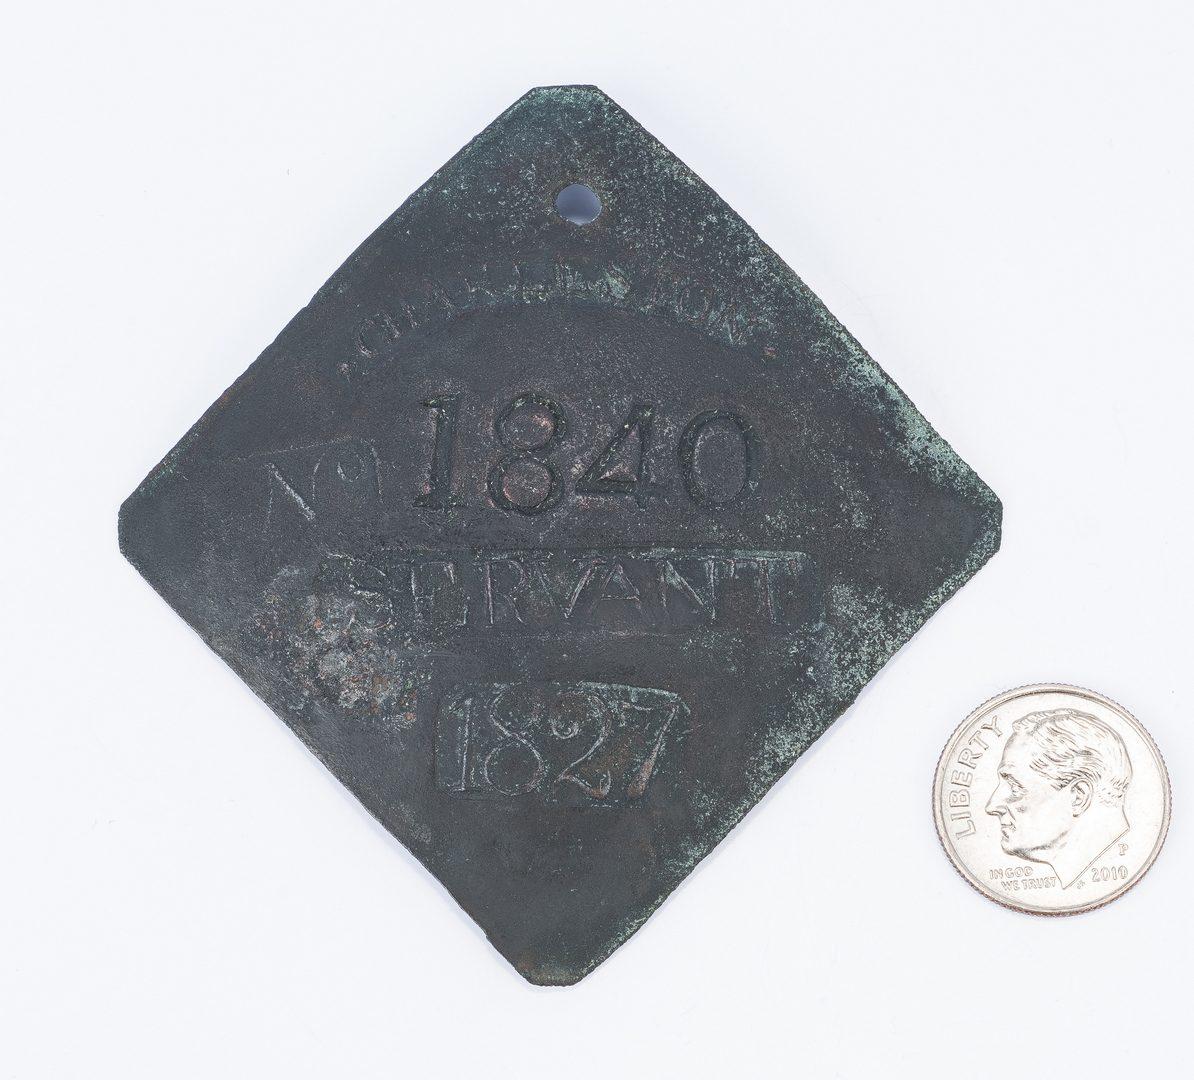 Lot 342: 1827 Charleston Lafar Servant Slave Hire Badge, Number 1840